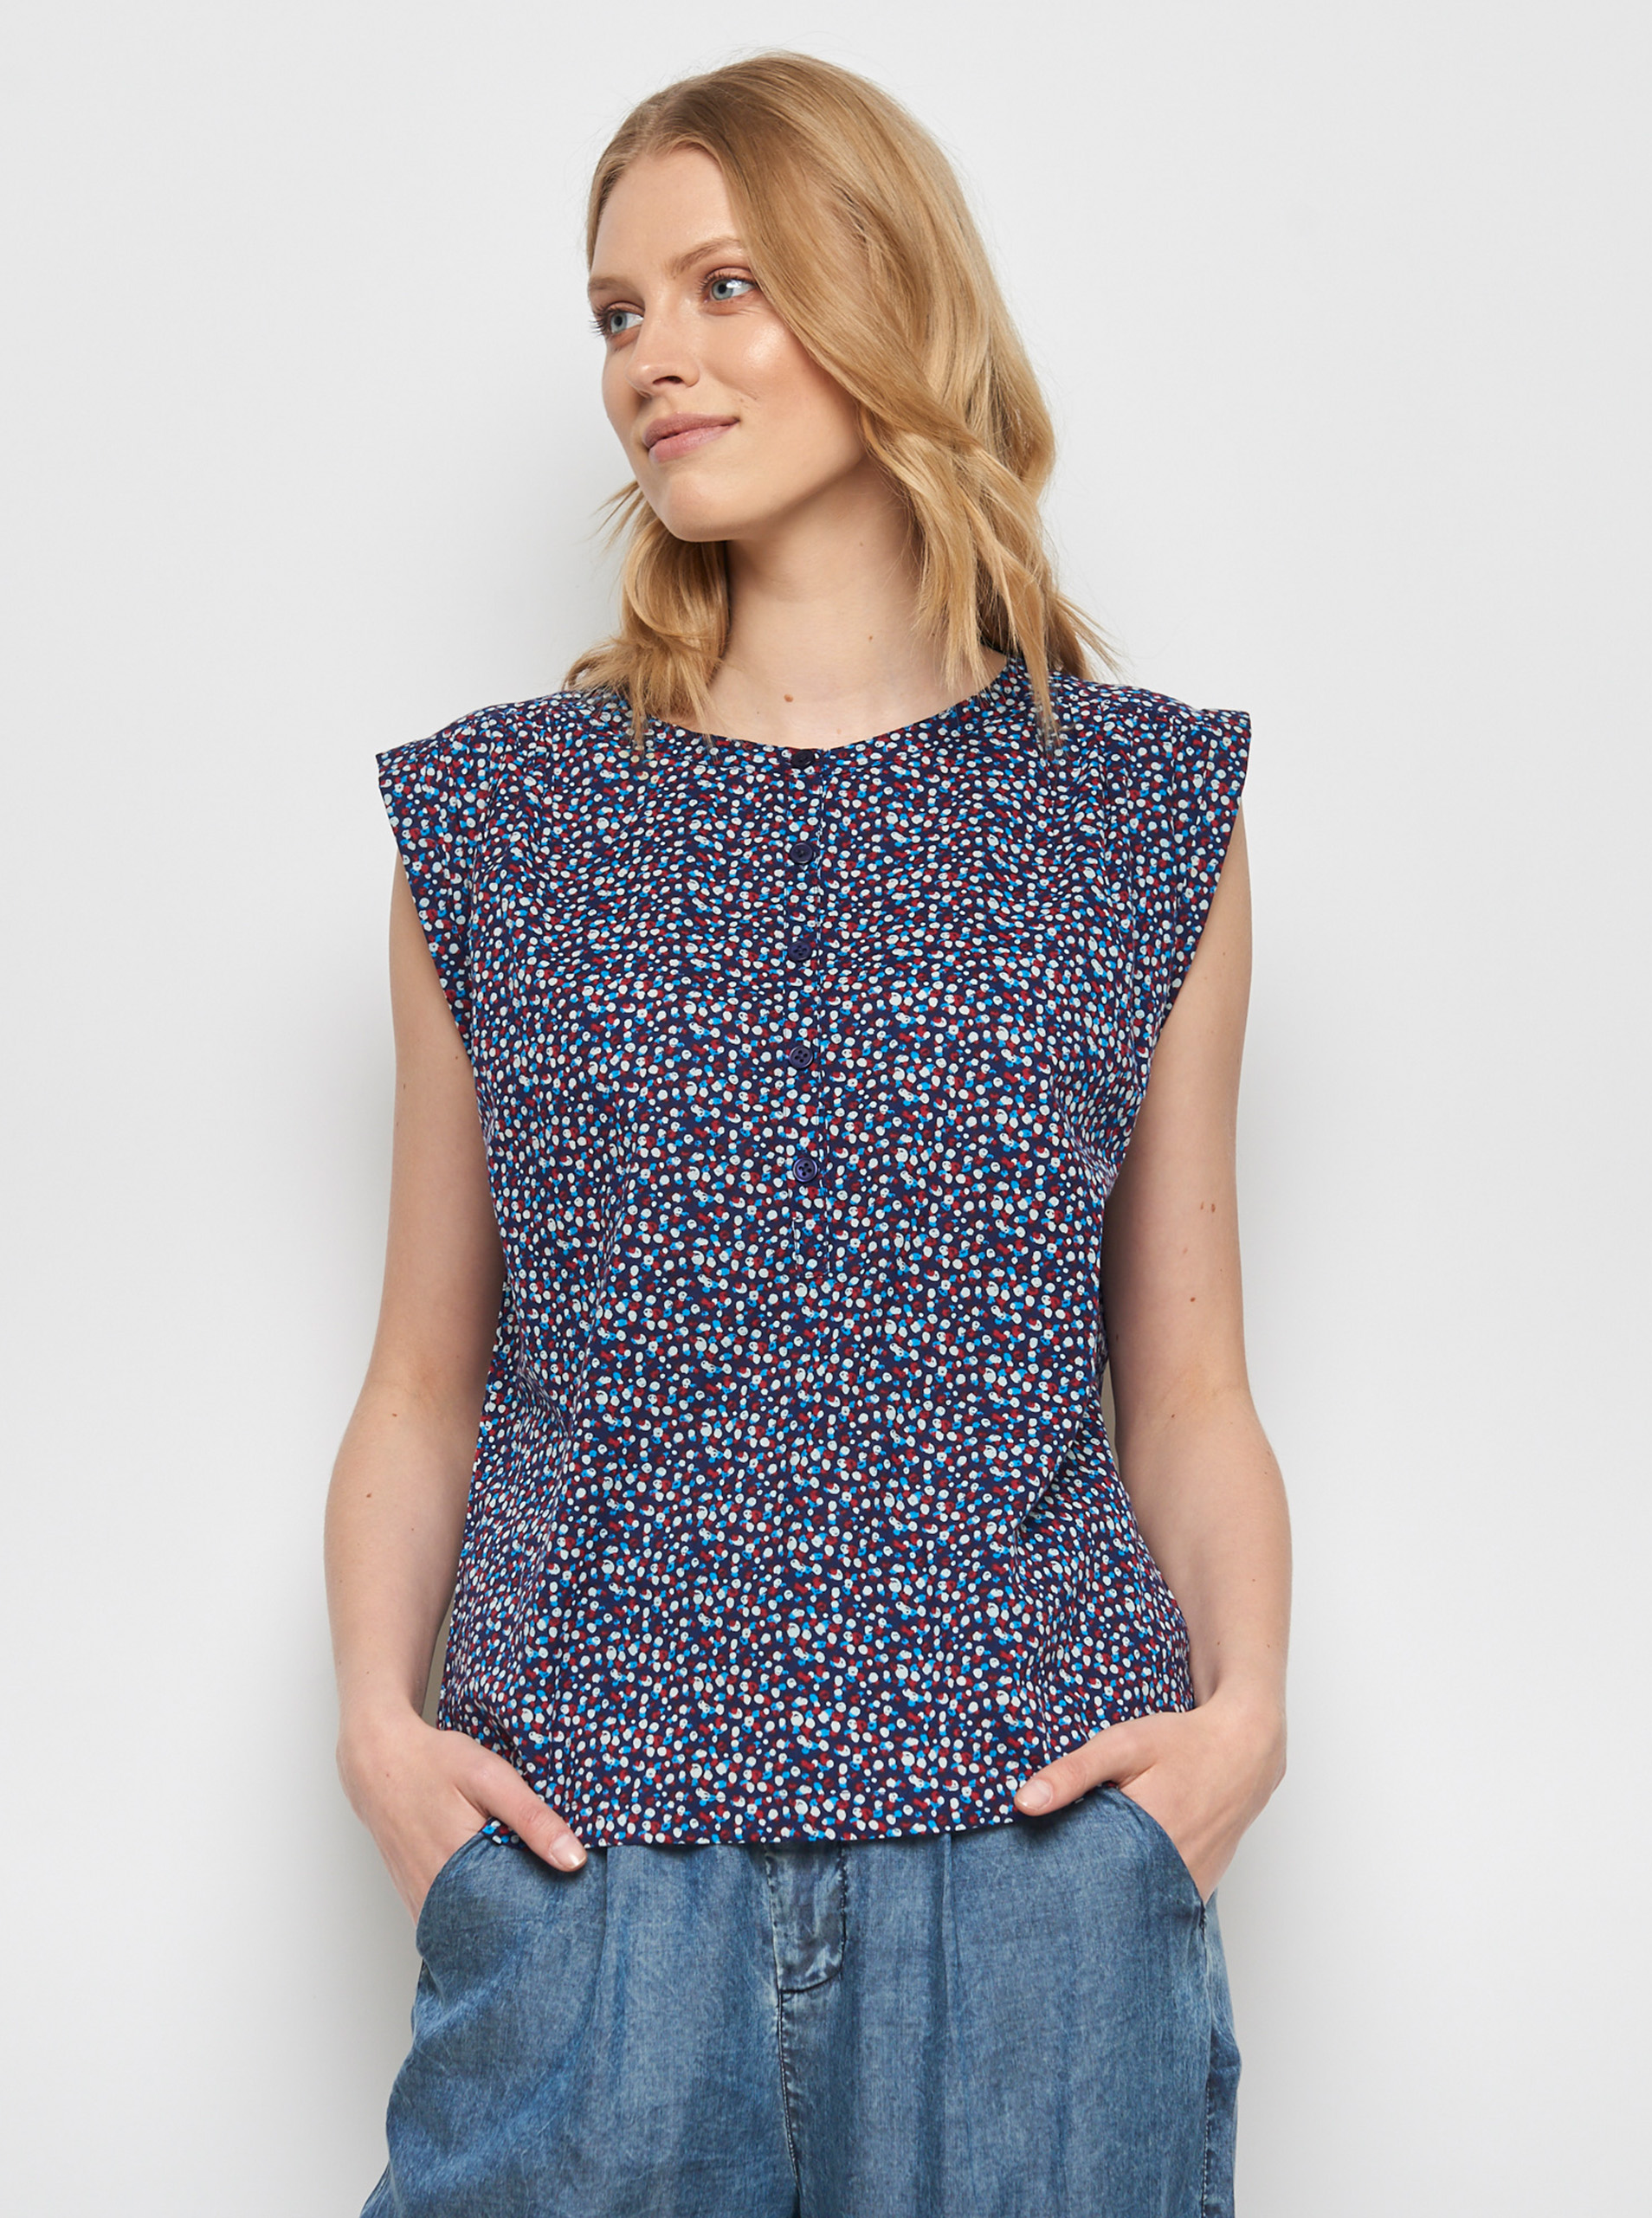 Tranquillo modra bluza Lamin z barvnimi motivi